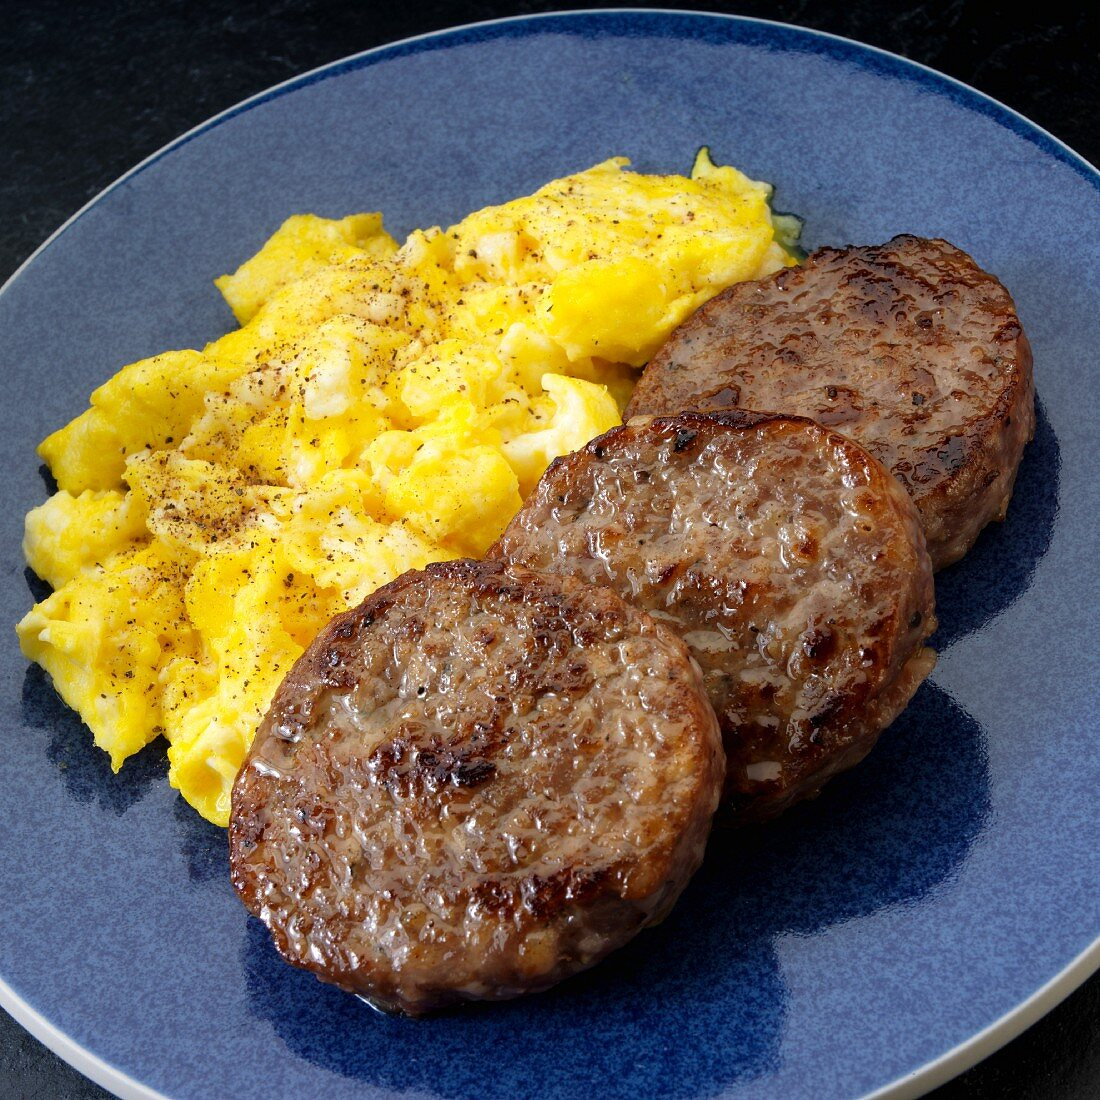 Pork sausage patties with scrambled eggs